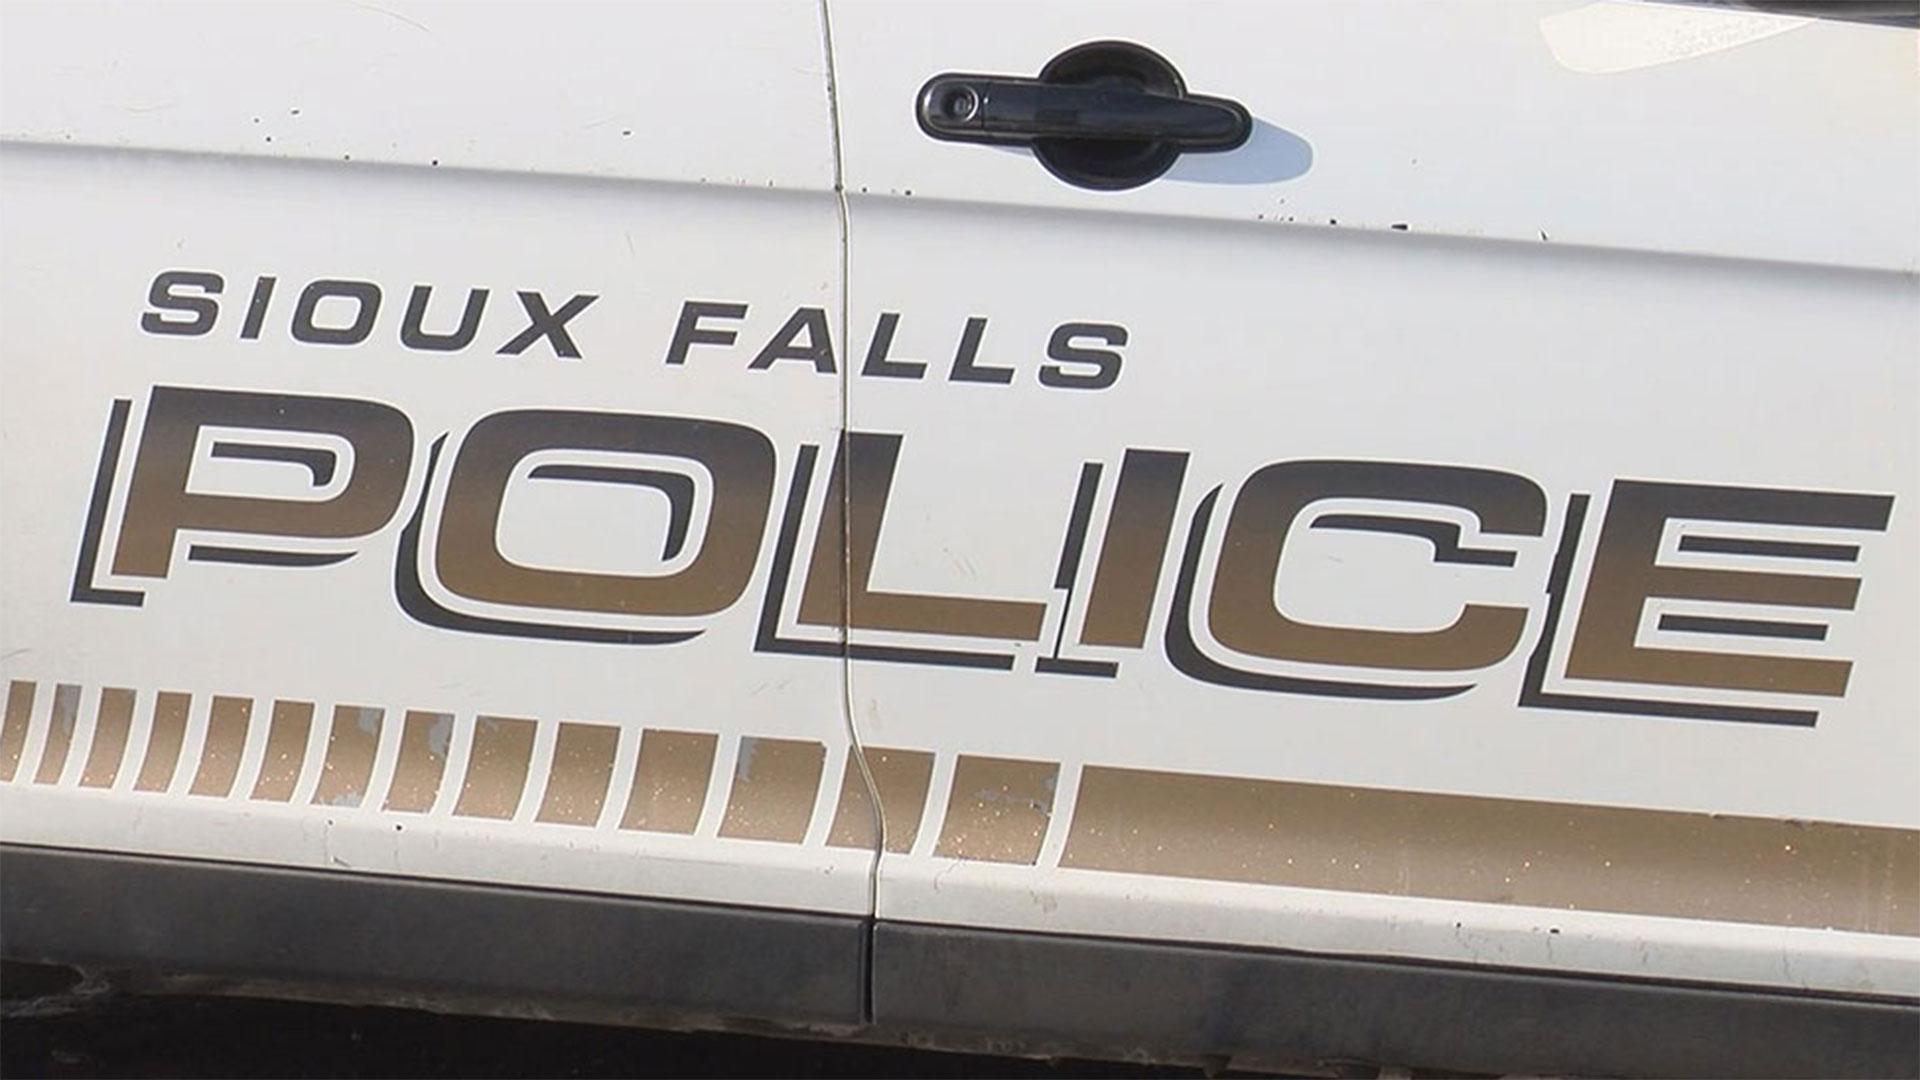 KELO Sioux Falls Police SFPD